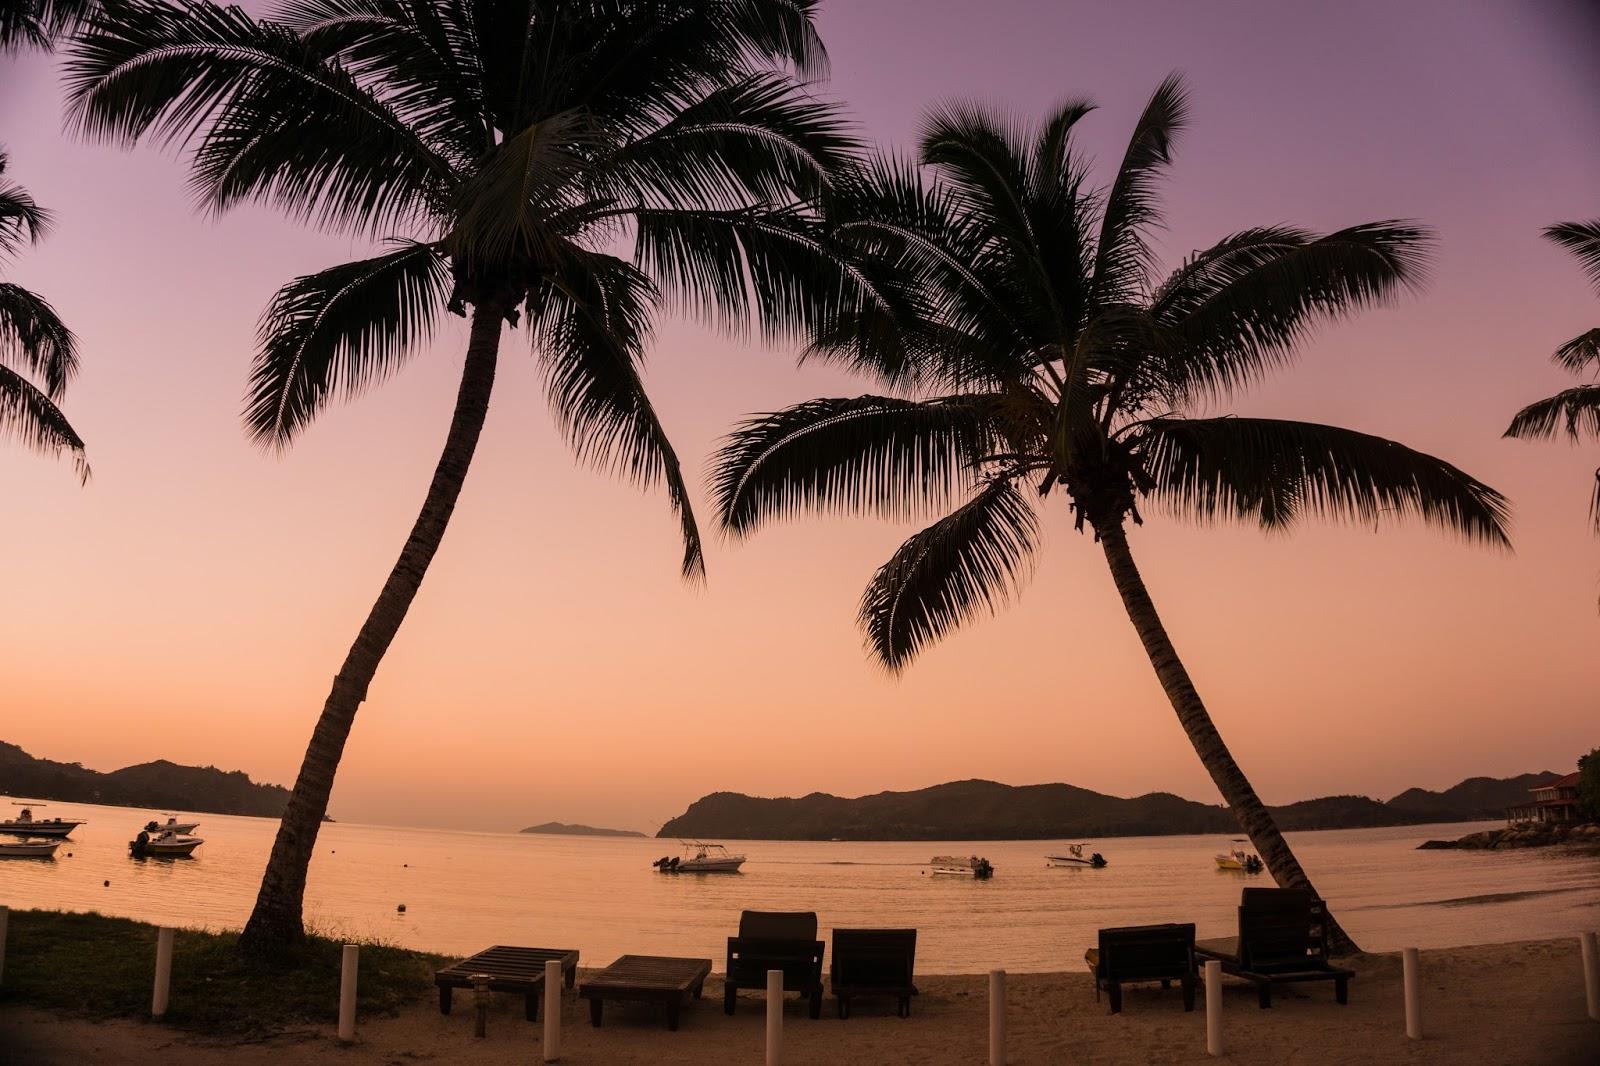 Seychelles photography, Seychelles no filter, Seychelles island, Praslin, Seychelles sunset, travel blog, polish girl, lifestyle blog